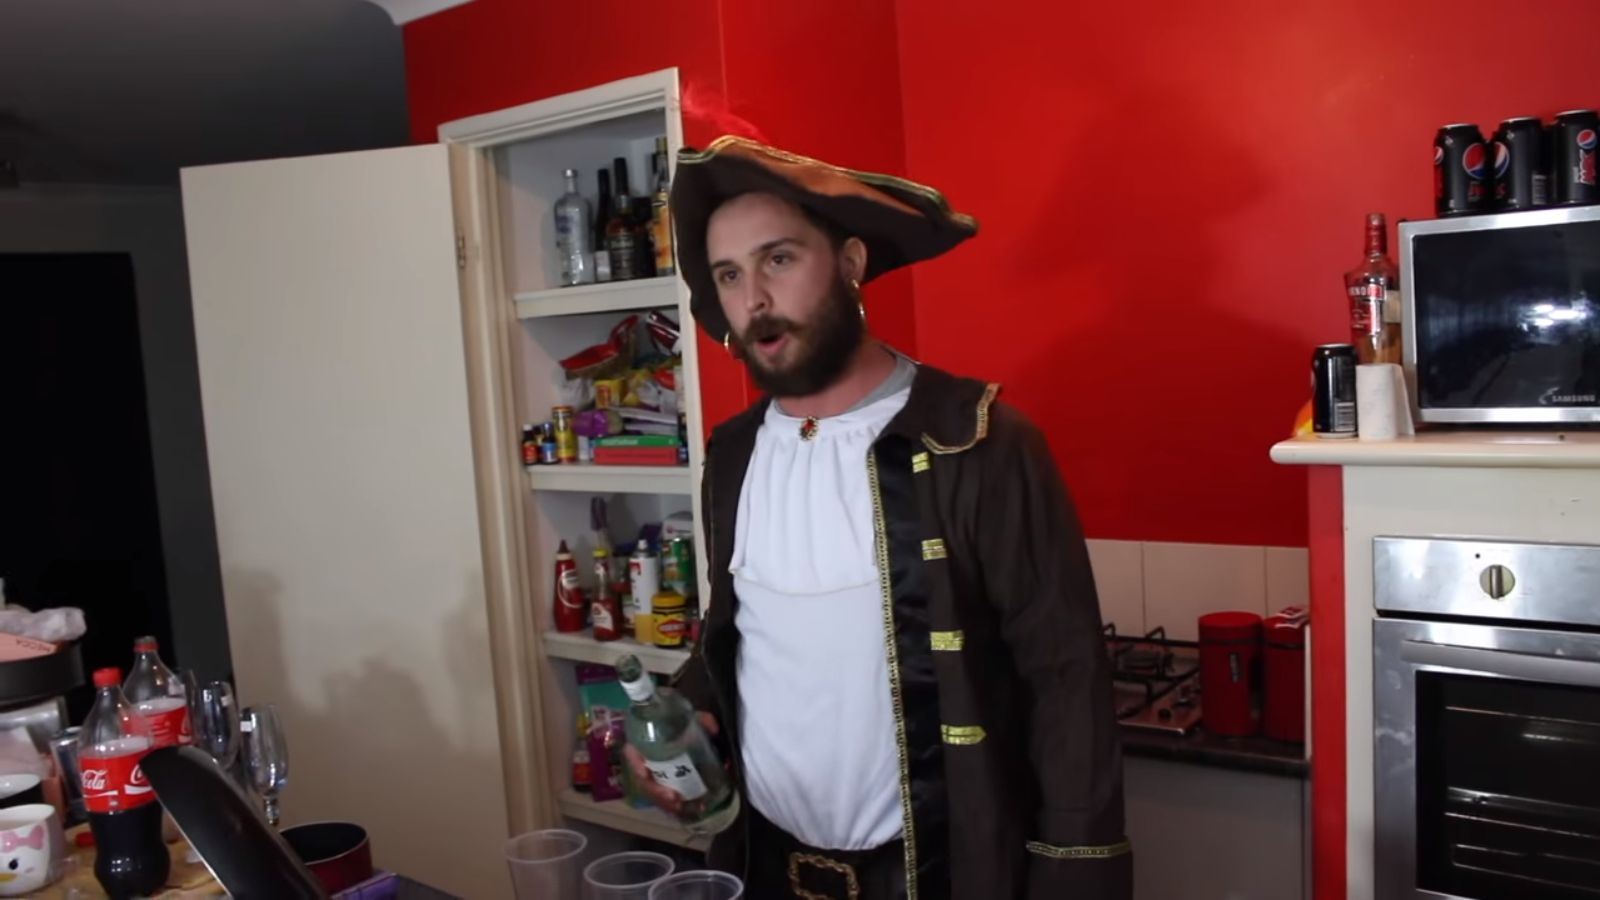 Biographical Full Name, Pirate